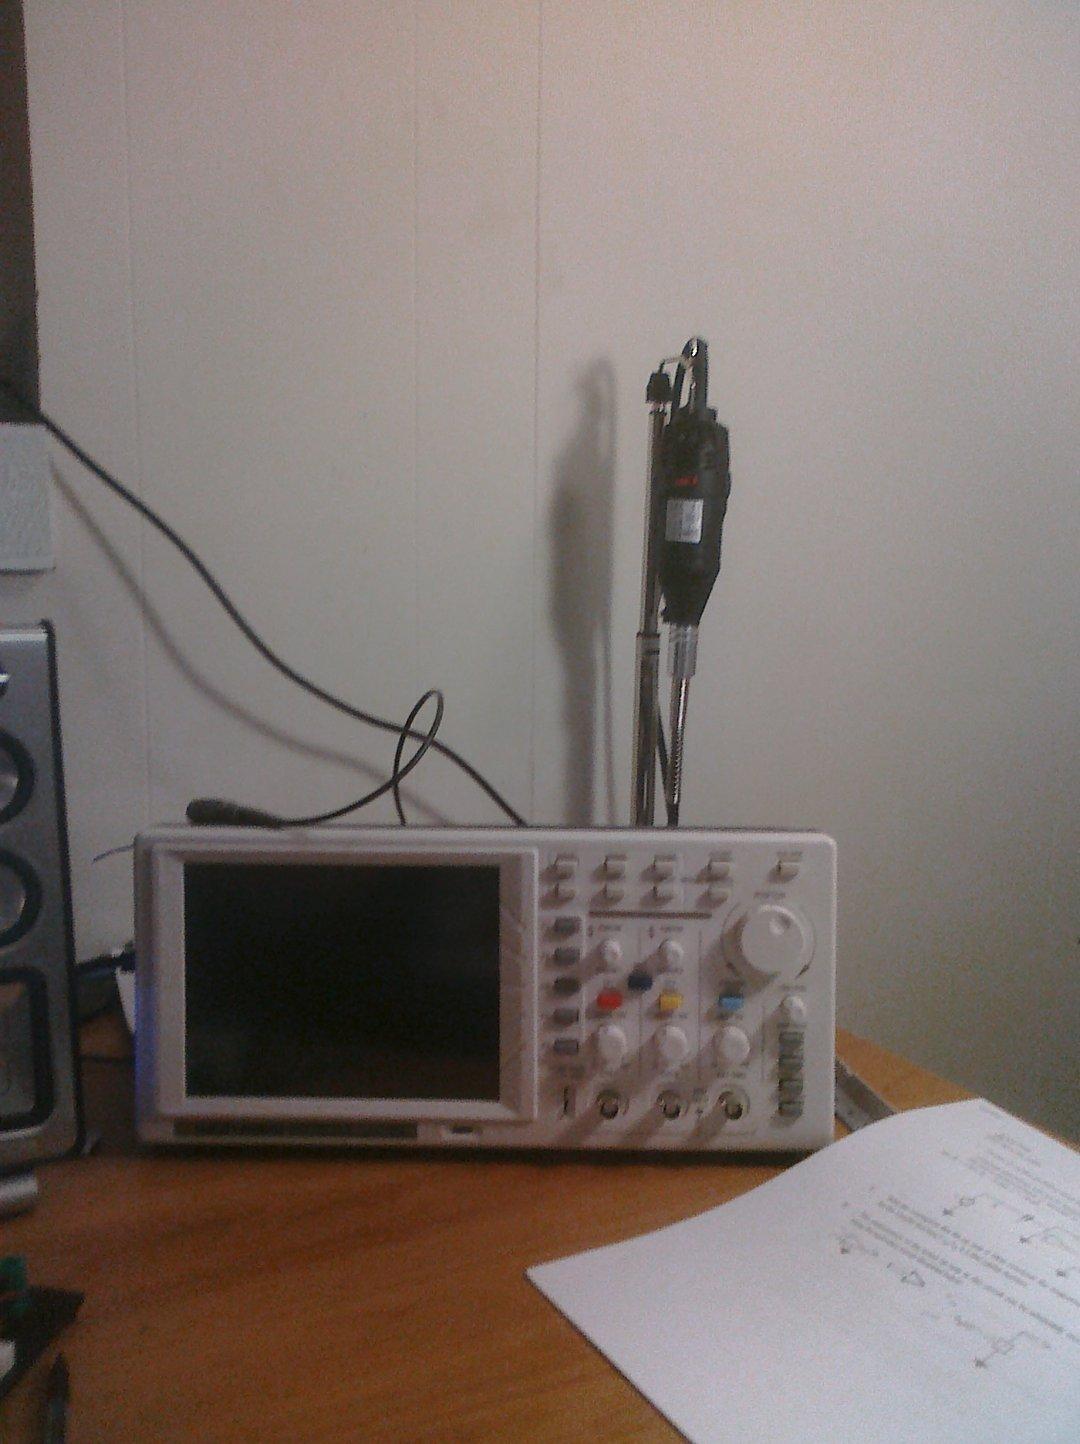 Oscilloscope and Dremmel